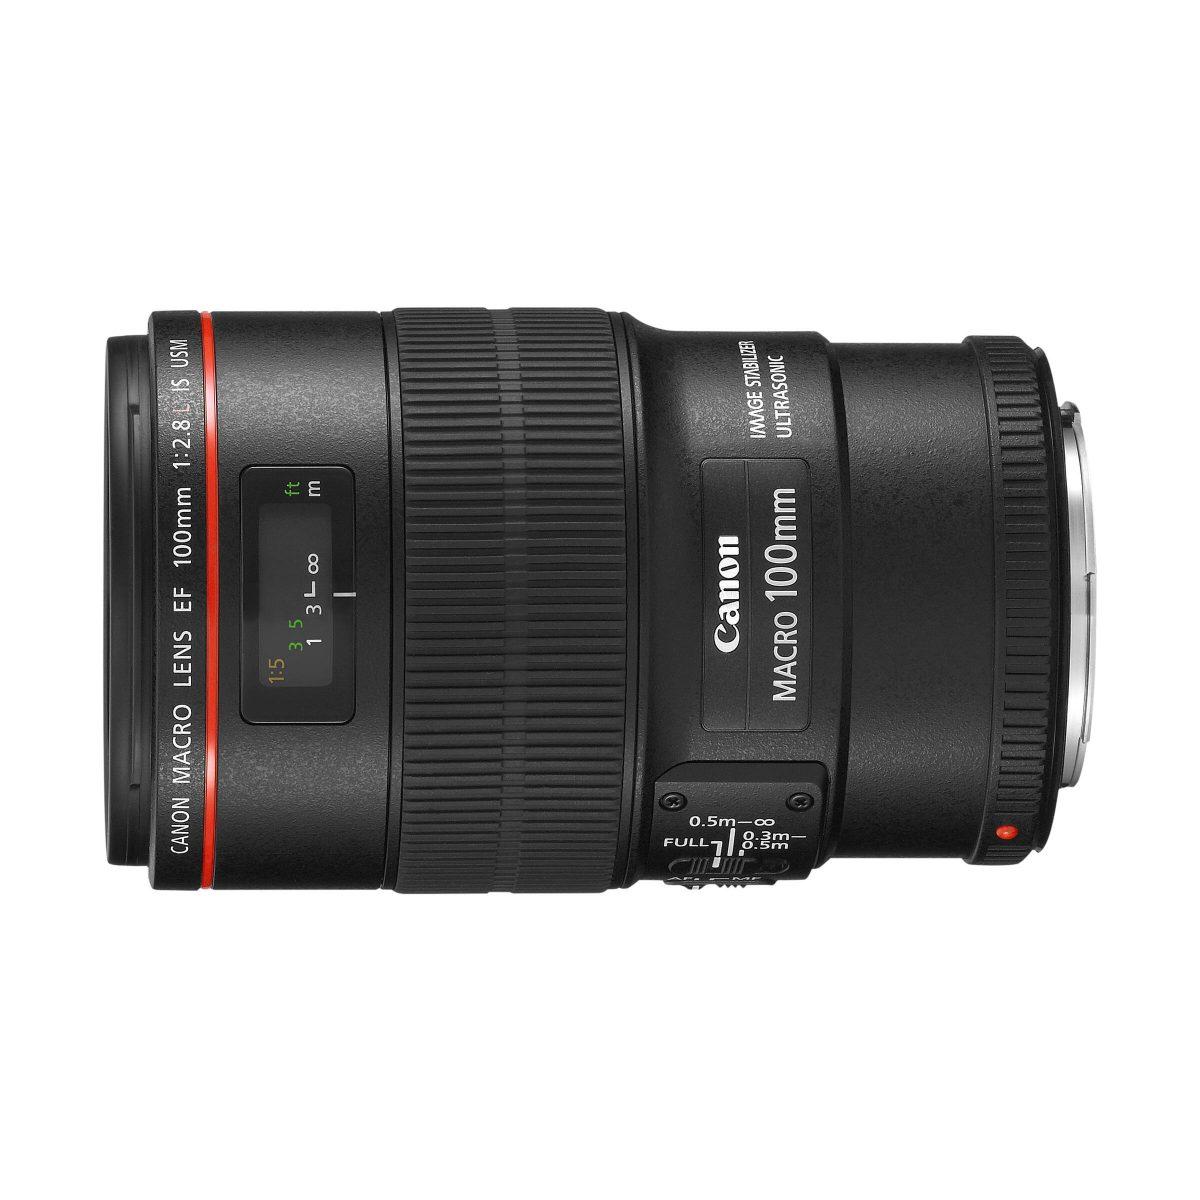 Canon 100/F2.8 IS USM EF-L Macro Objektiv (Preis mit Sofortrabatt)